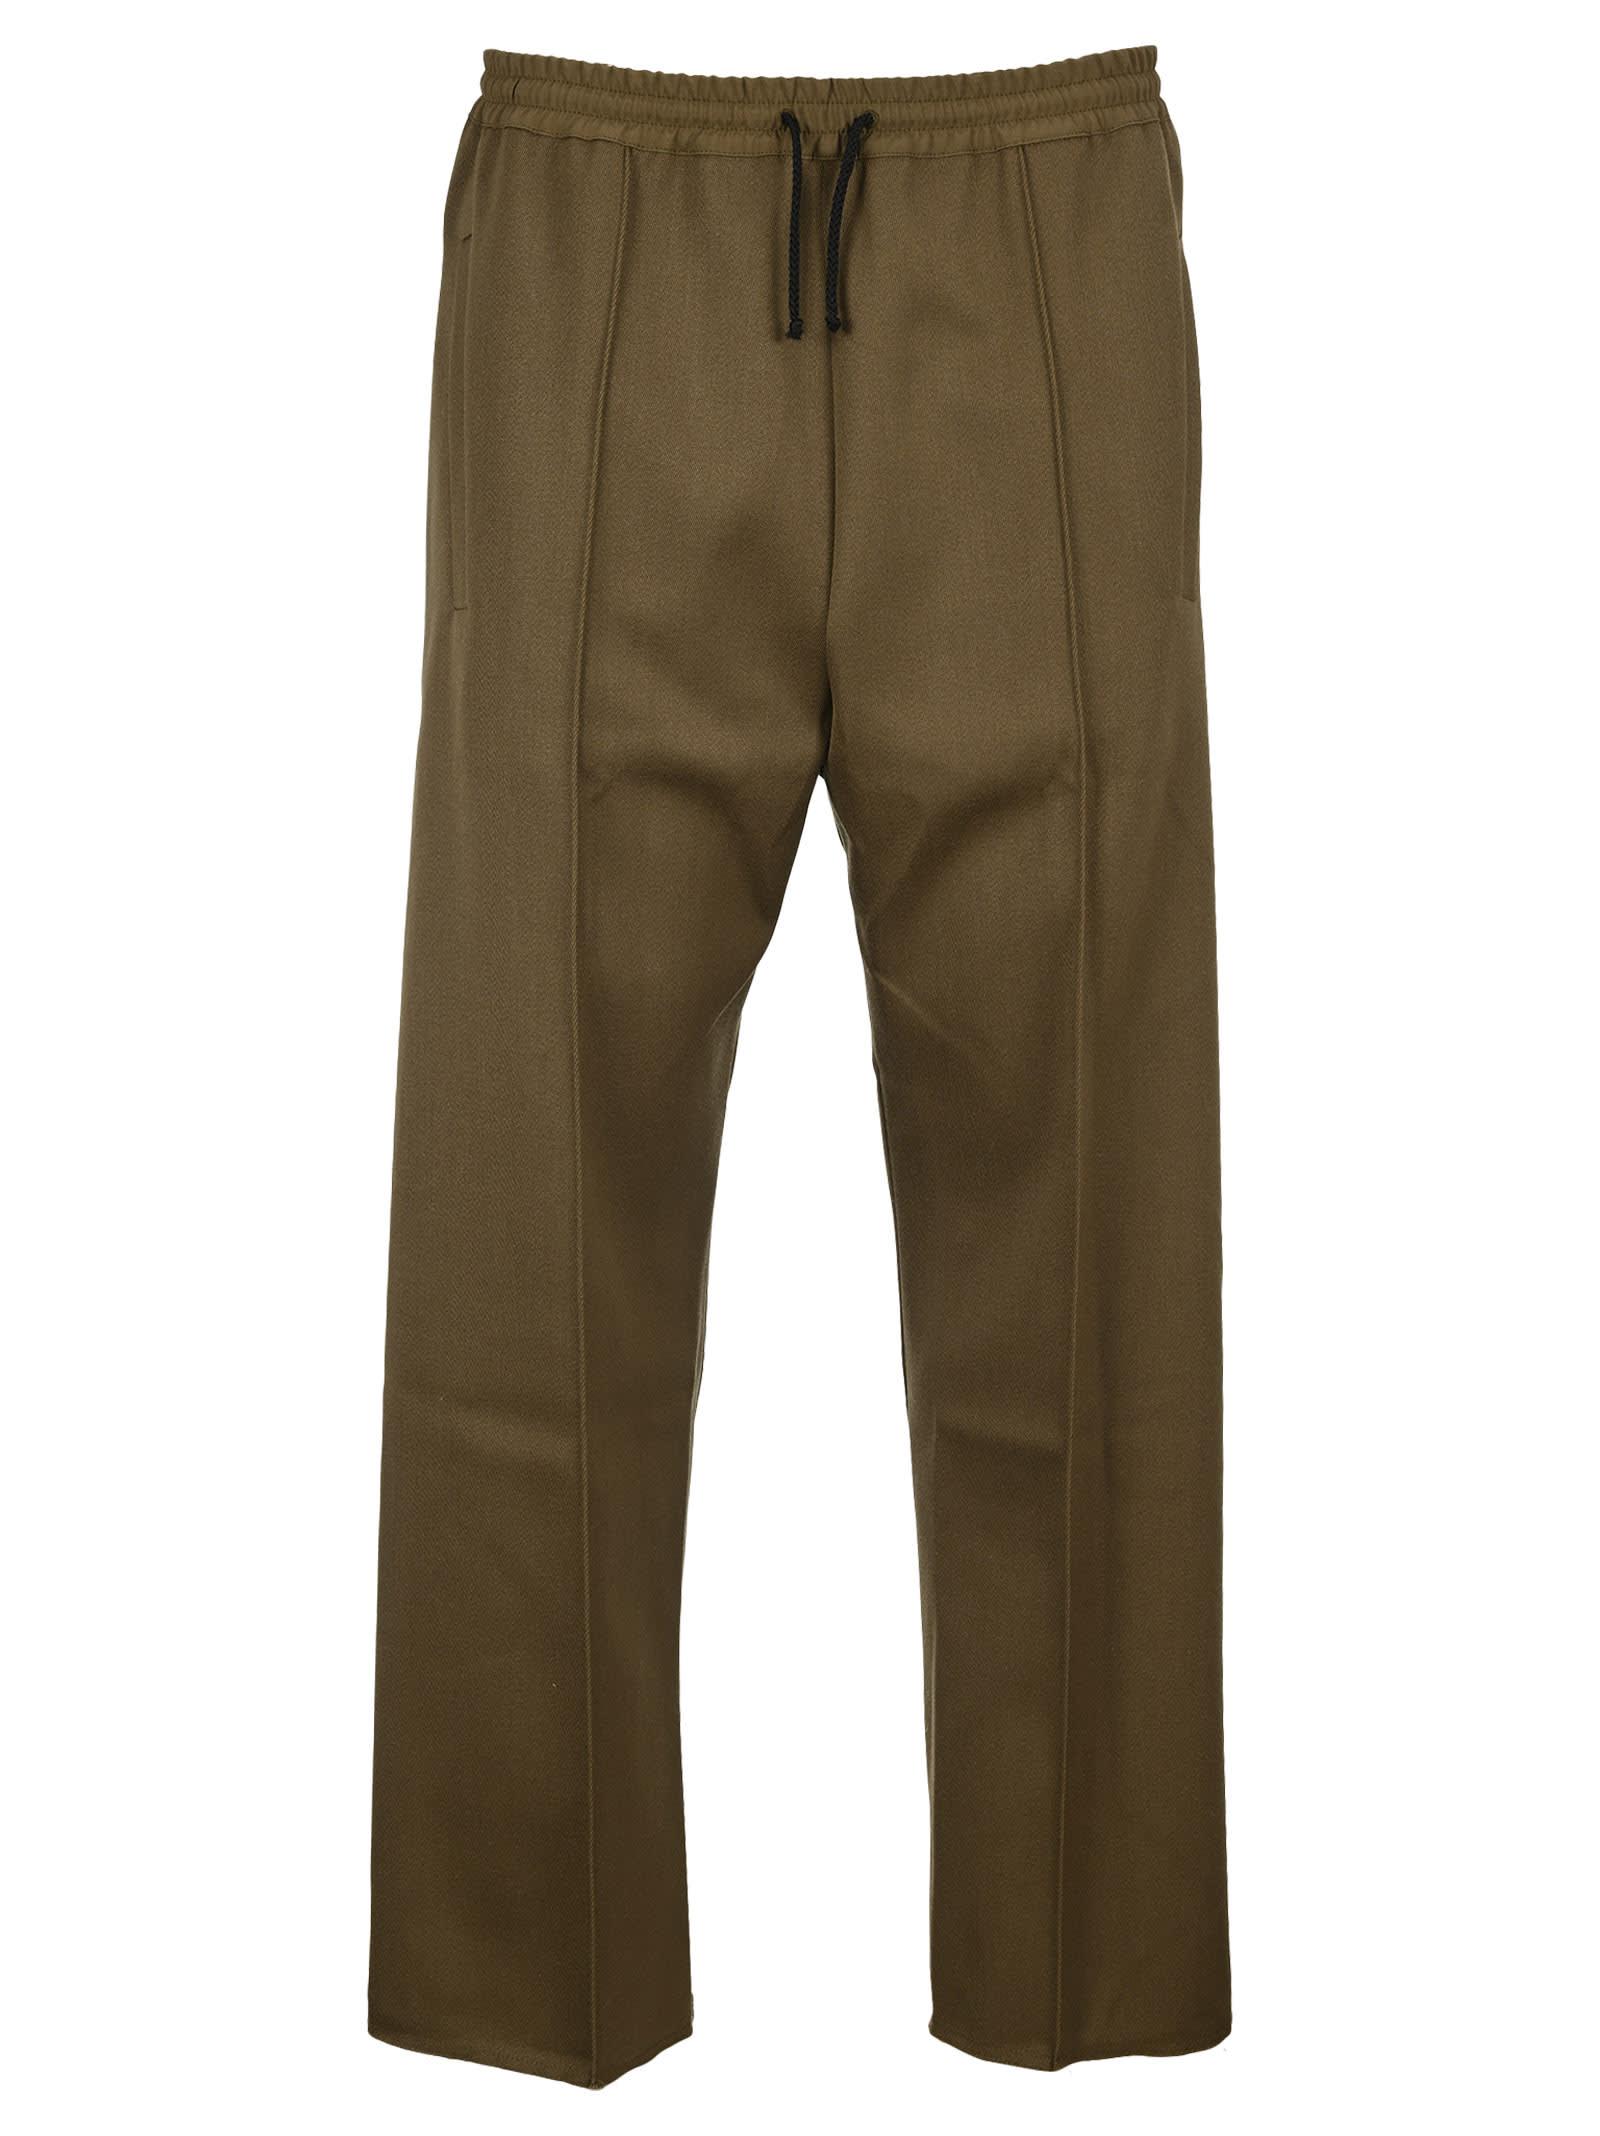 424 Drawstring Pants